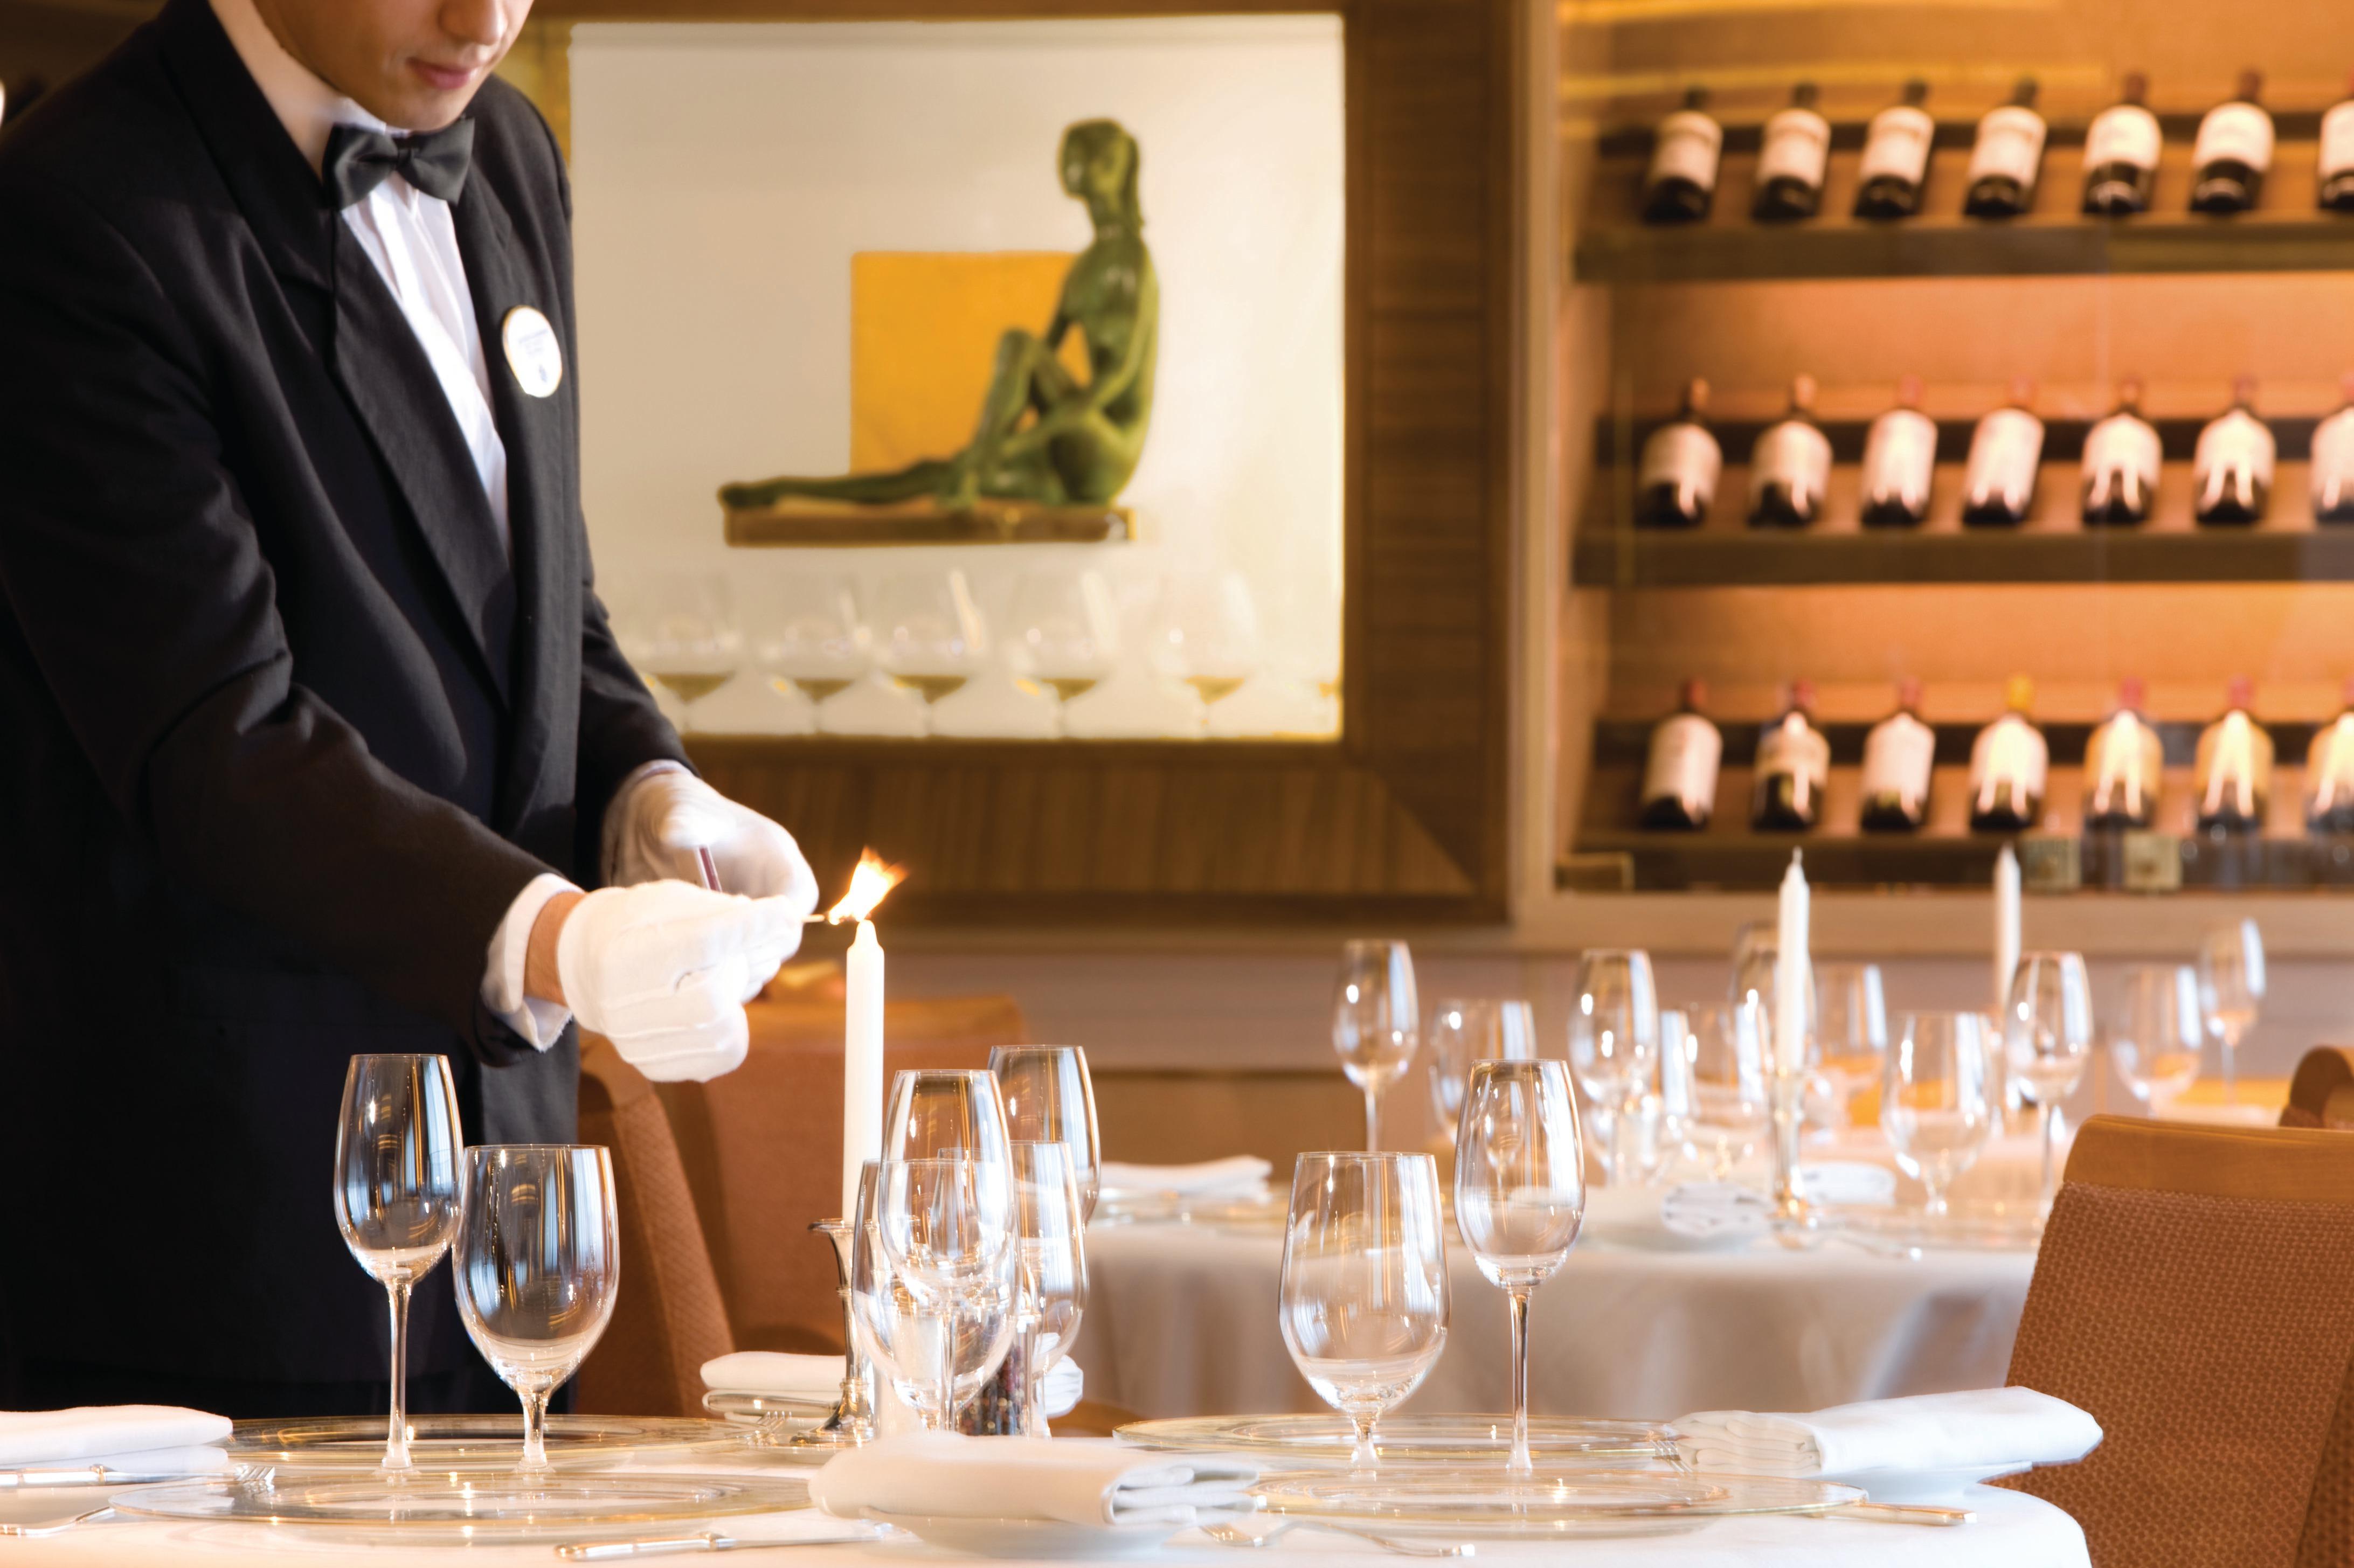 Silver Wind - Le Champagne restaurant